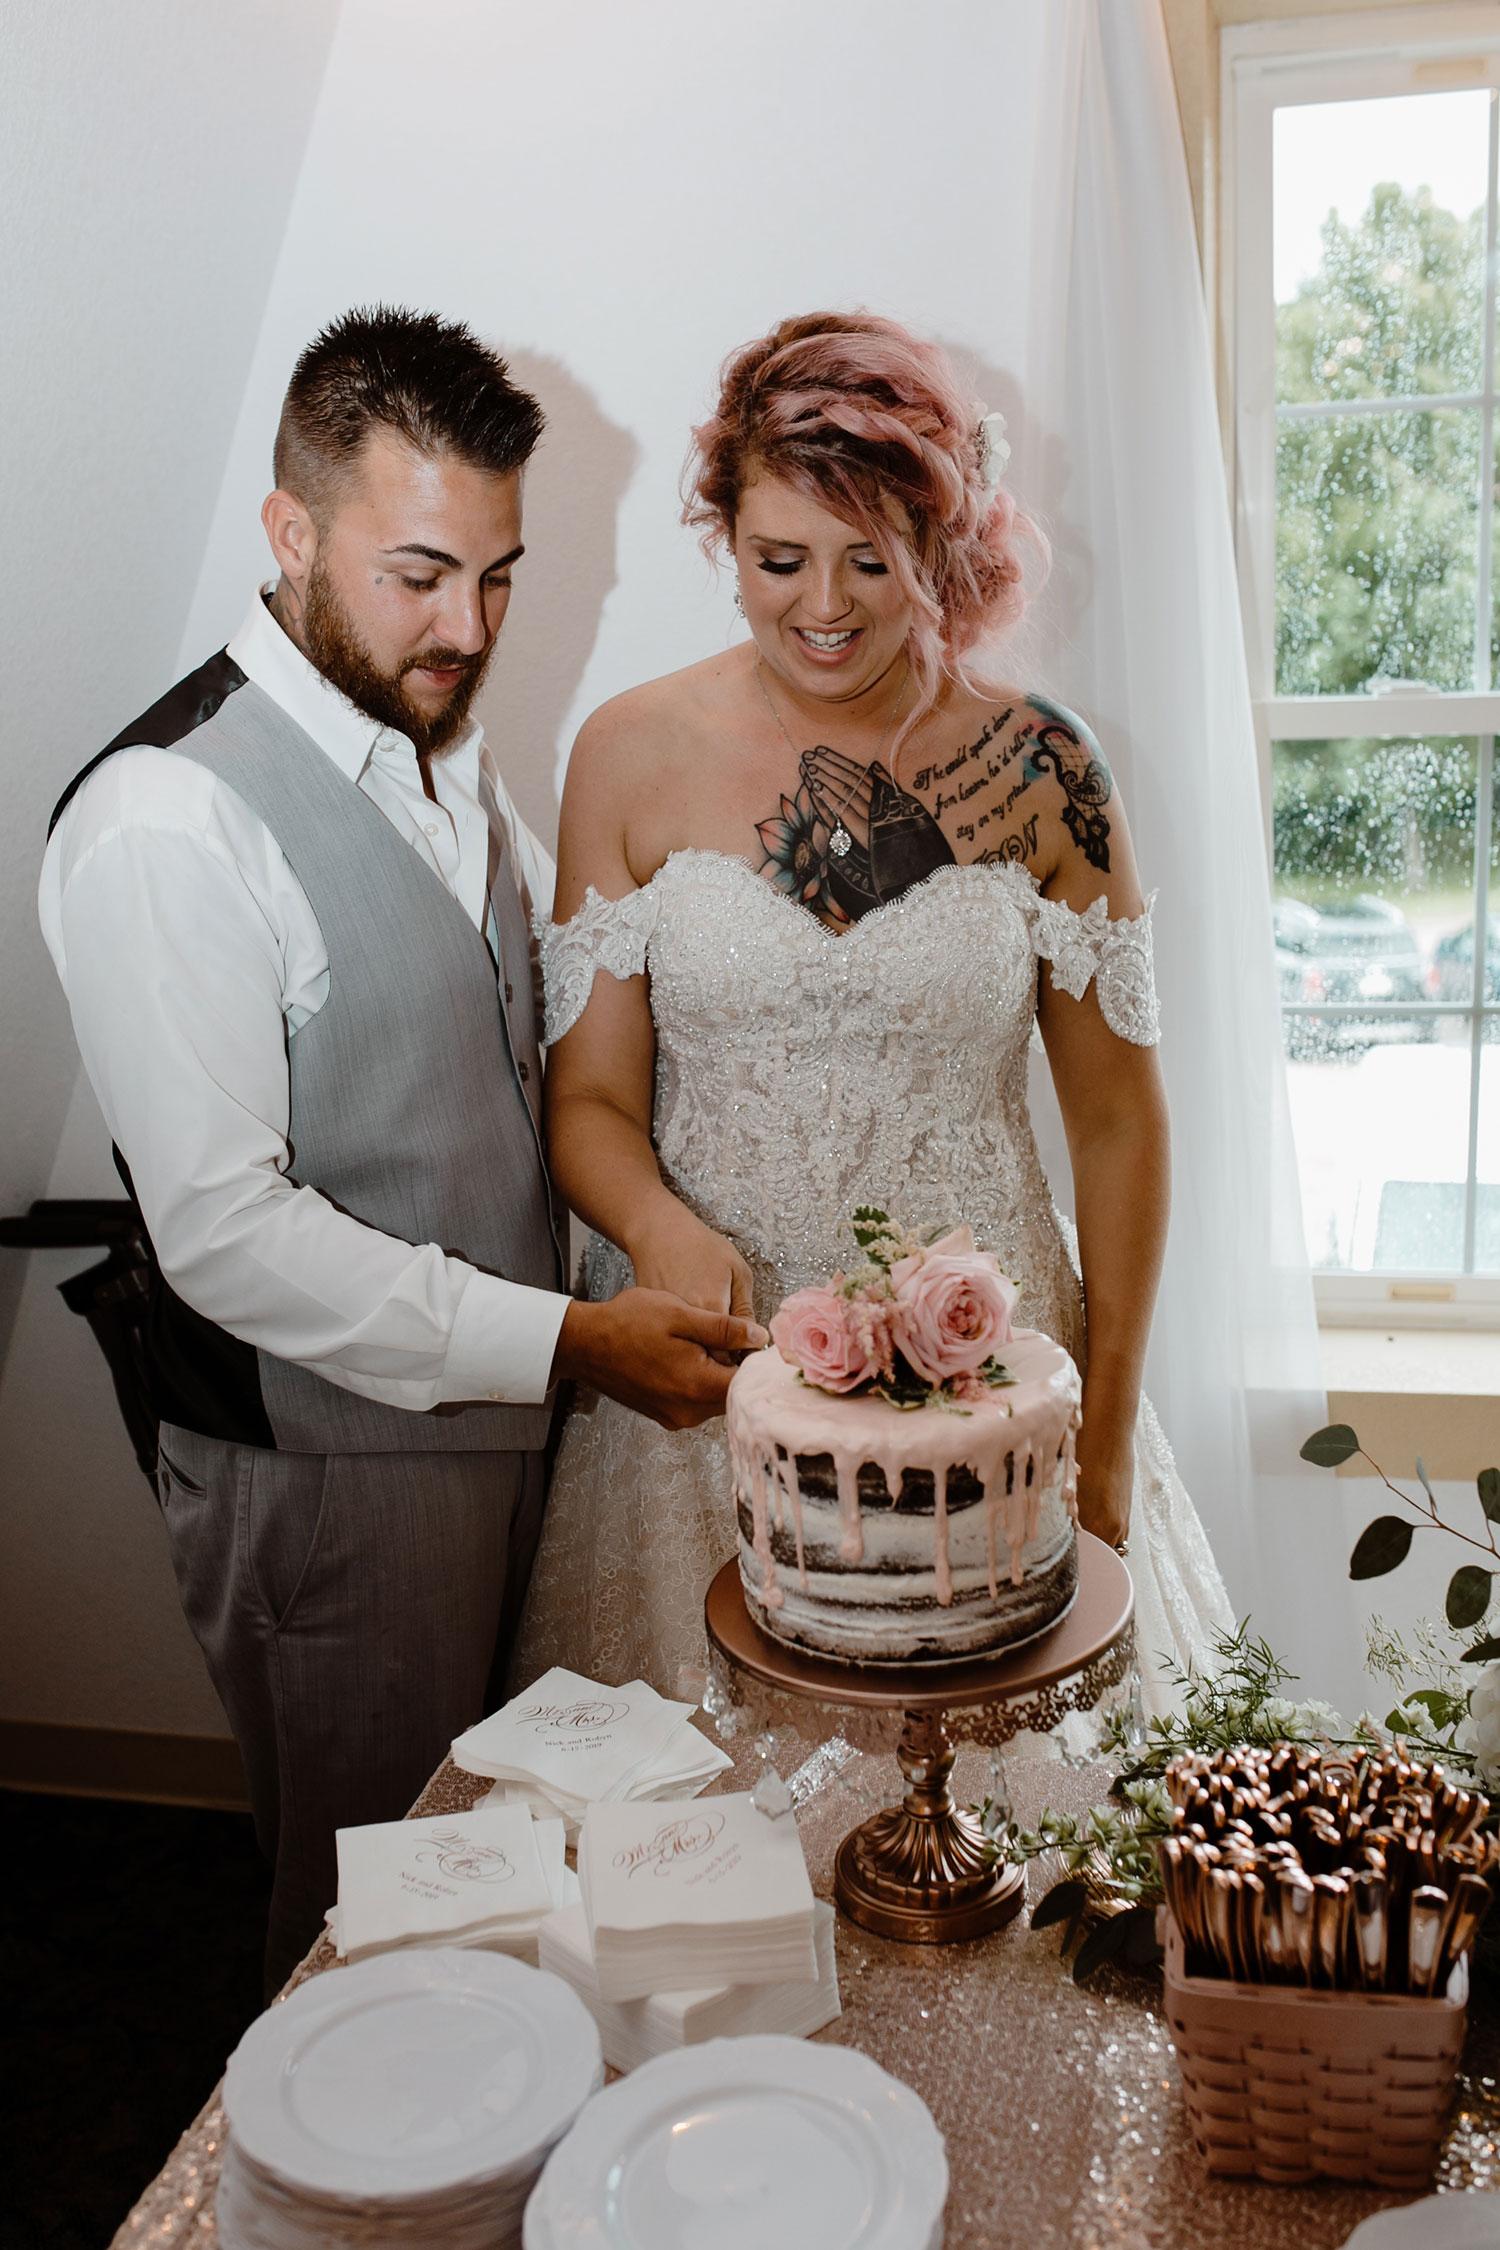 bride-groom-cutting-cake-wedding-summerset-winery-indianola-iowa-raelyn-ramey-photography.jpg